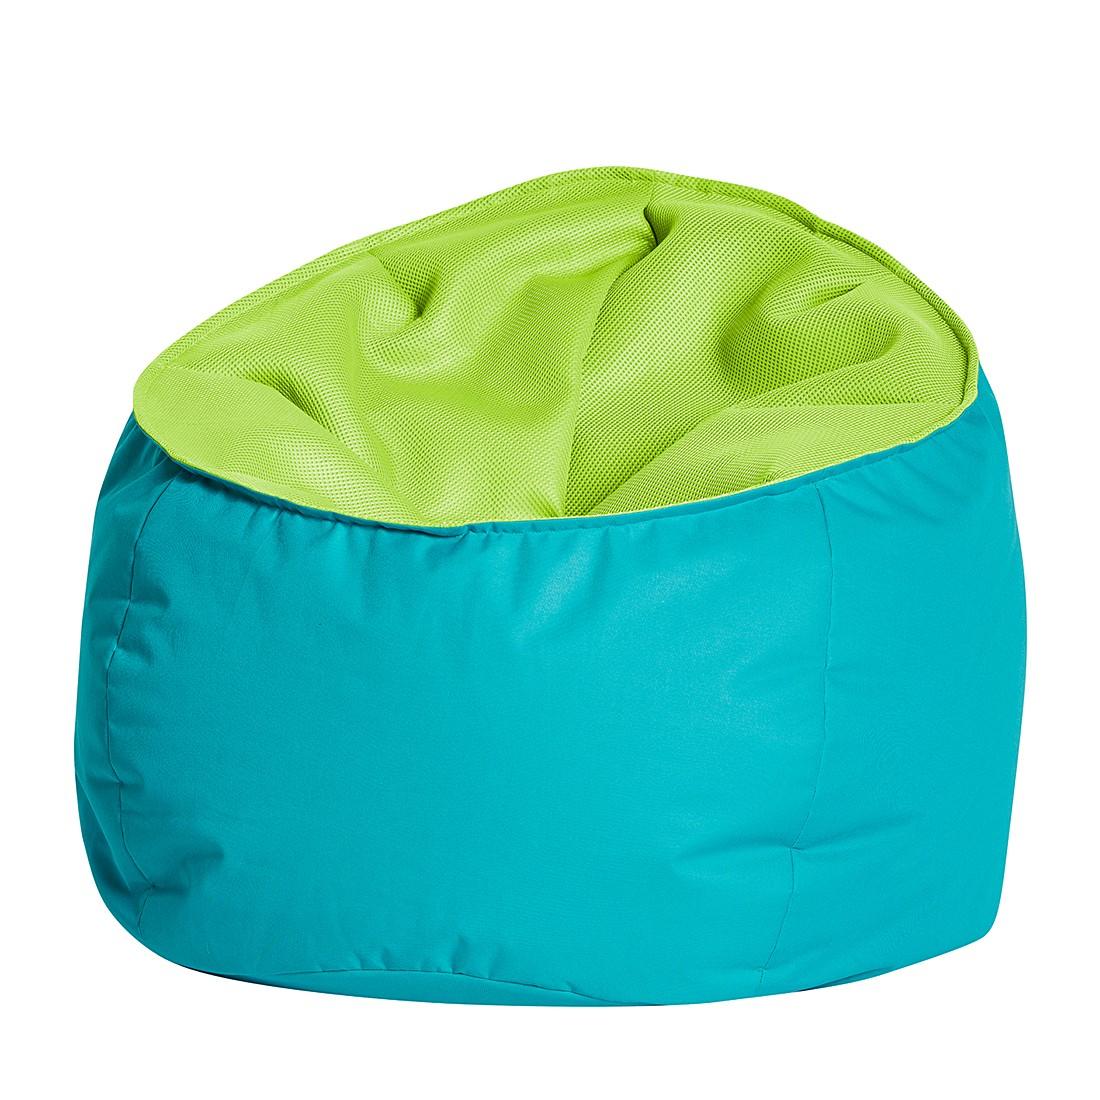 Sitzsack Globe Mesh – Grün, Fredriks online kaufen